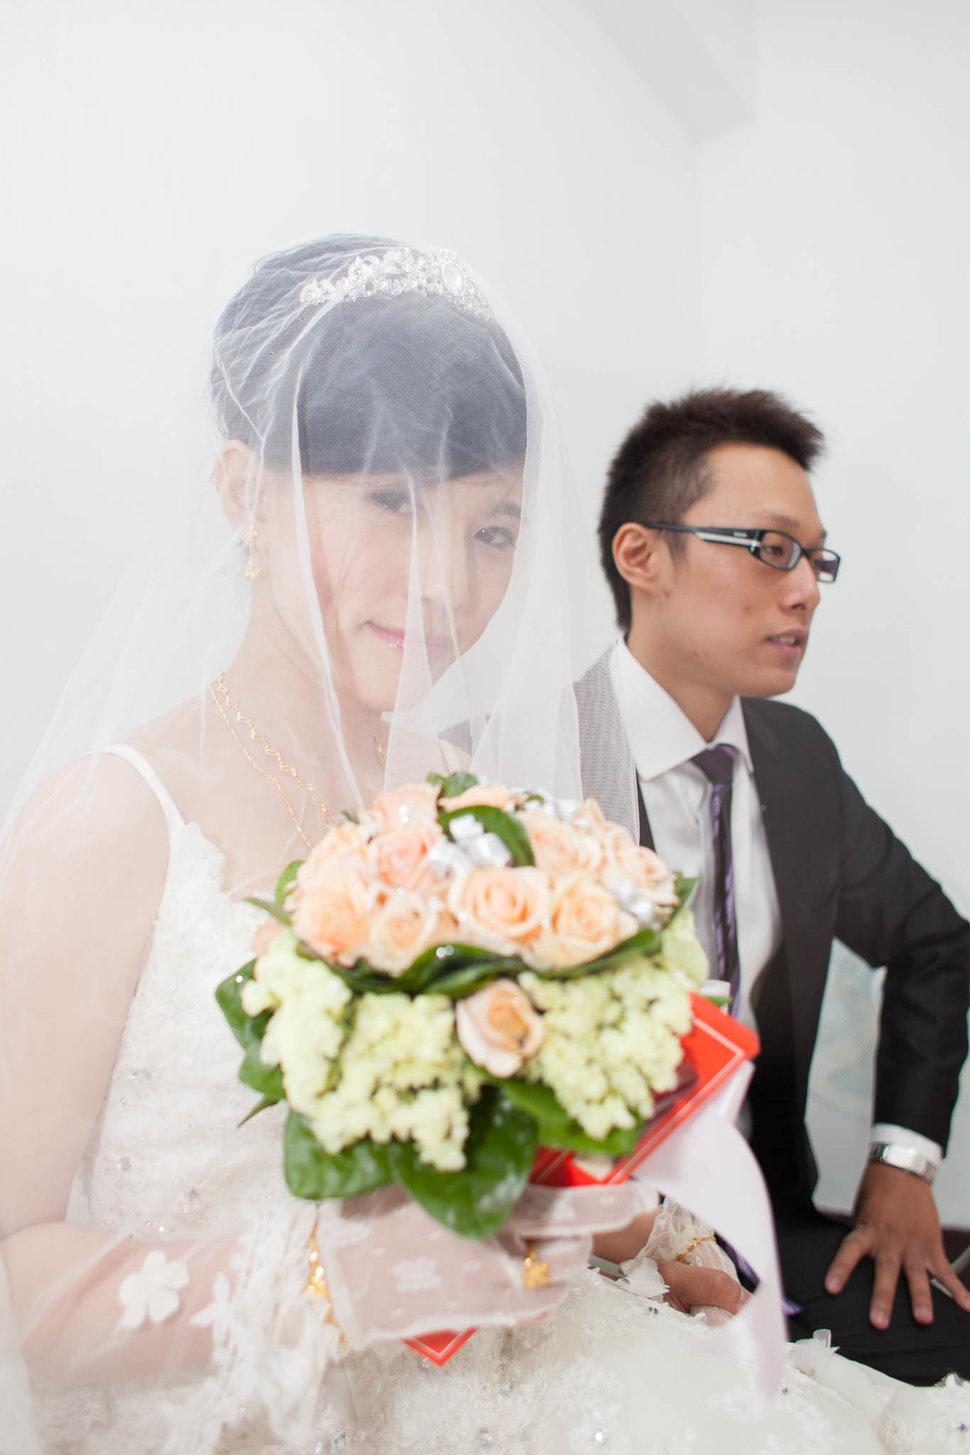 18PHOTO-青蛙王子娶新娘❤️(編號:218623) - 18PHOTO 婚紗影像攝影工作室 - 結婚吧